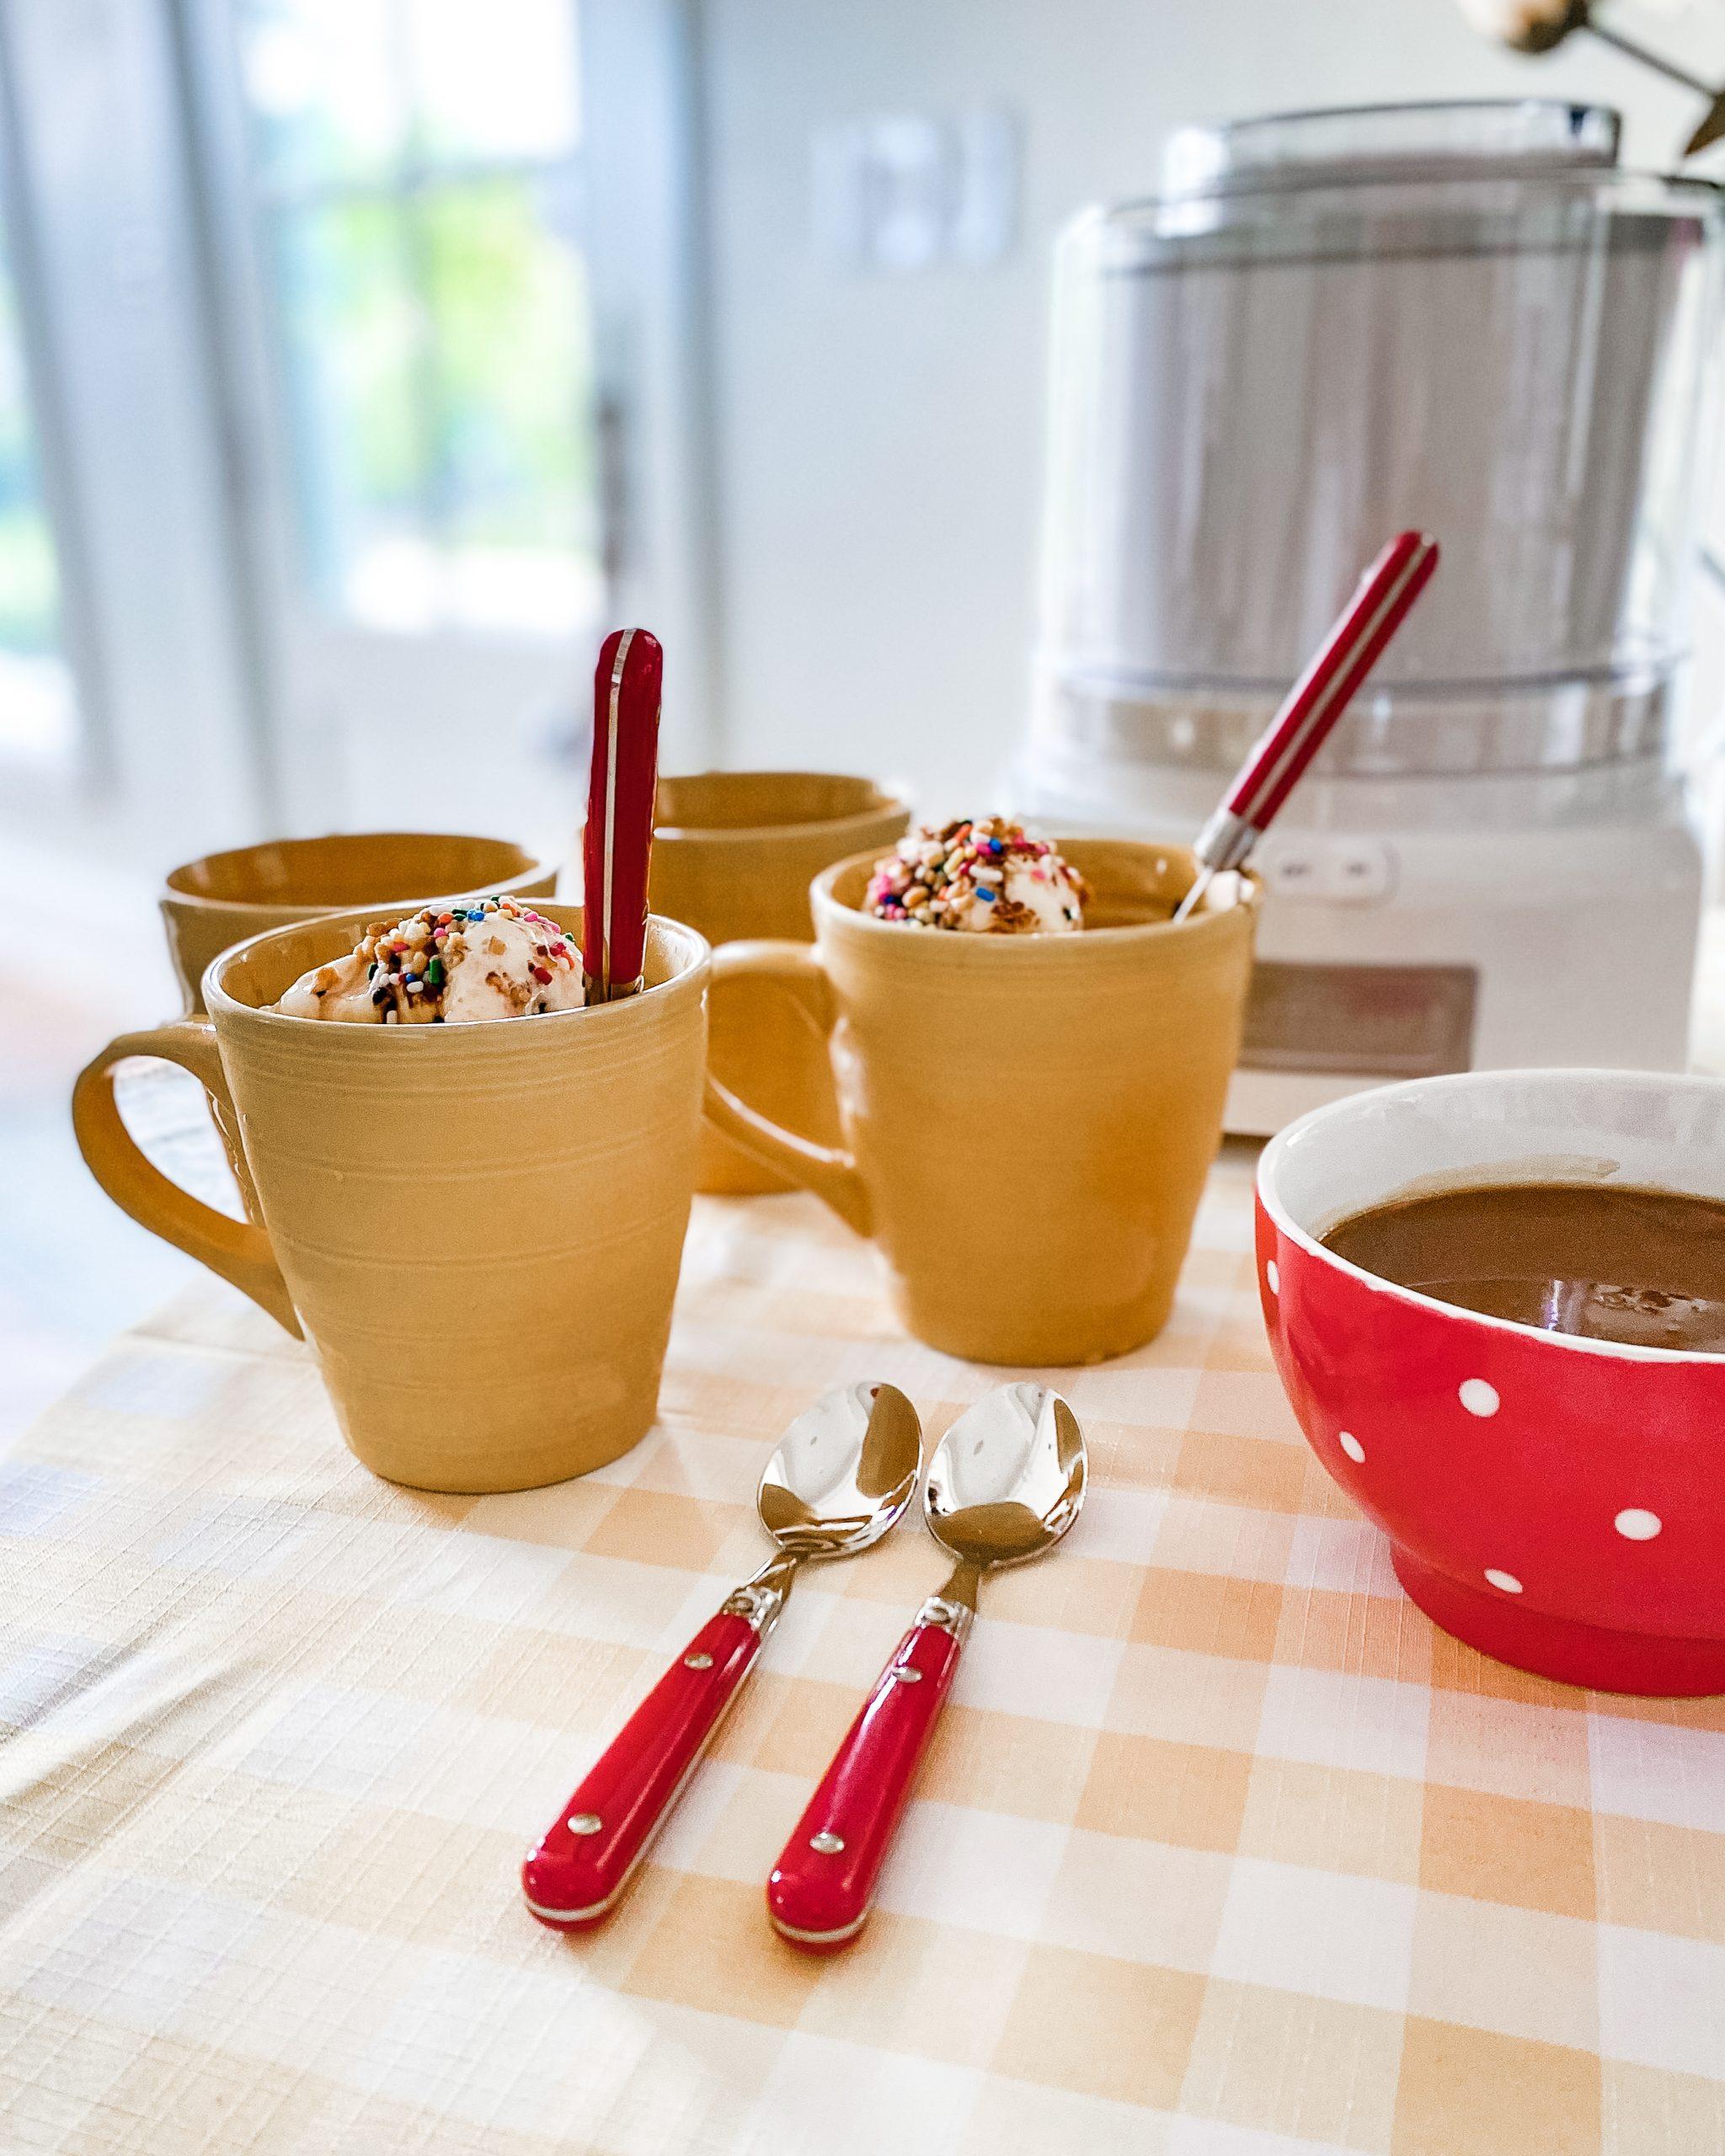 homemade ice cream sundaes